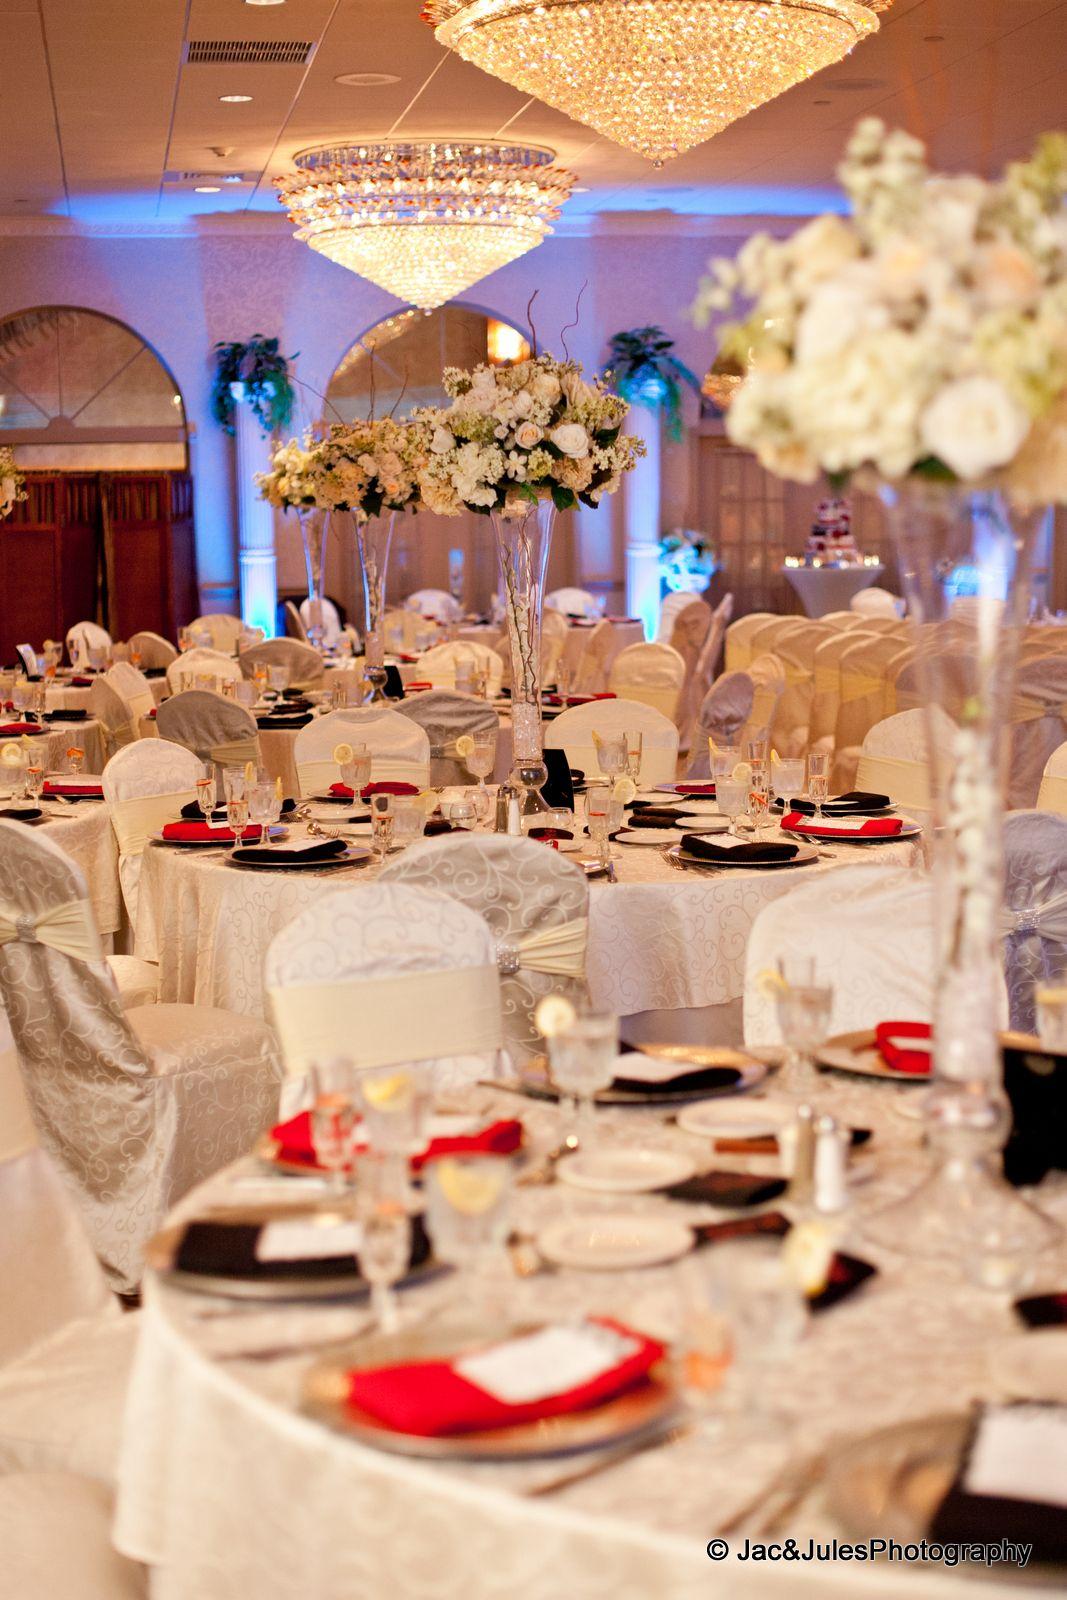 wedding venues asbury park nj%0A doubletree tinton falls sterling ballroom  Google Search   Wedding venues    Pinterest   Ballrooms  Wedding venues and Weddings